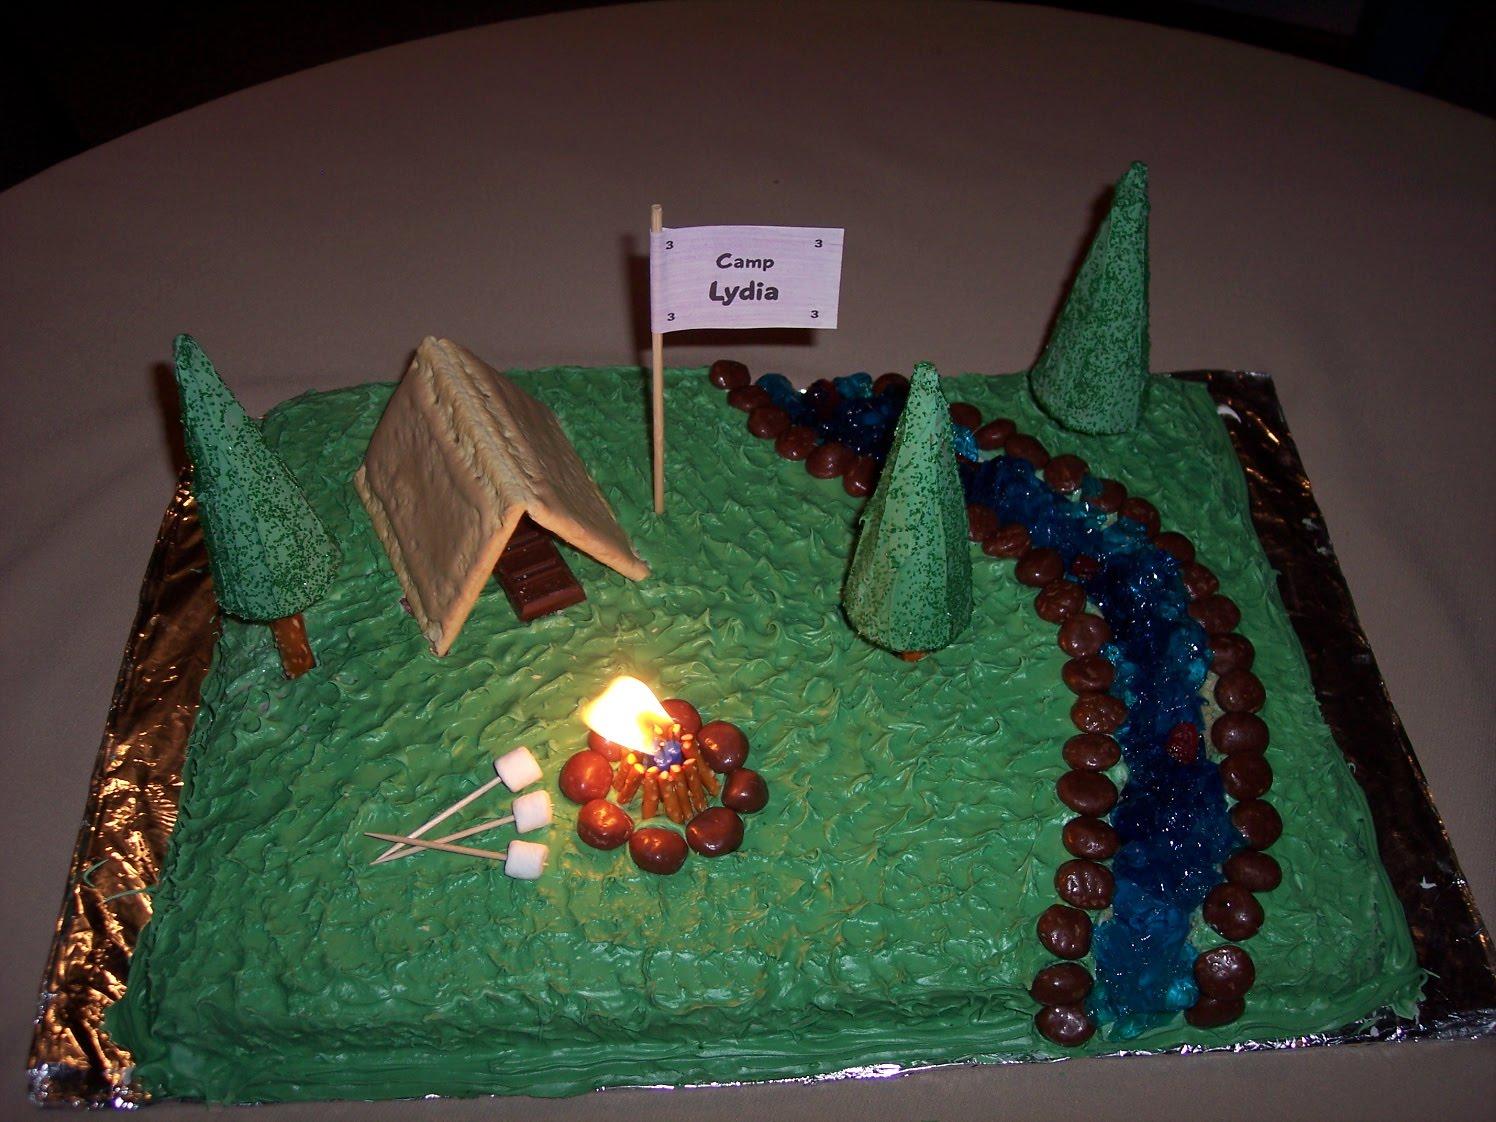 Cake Decorating Ideas Outdoors : Camping Cake - Kids Activities Saving Money Home ...